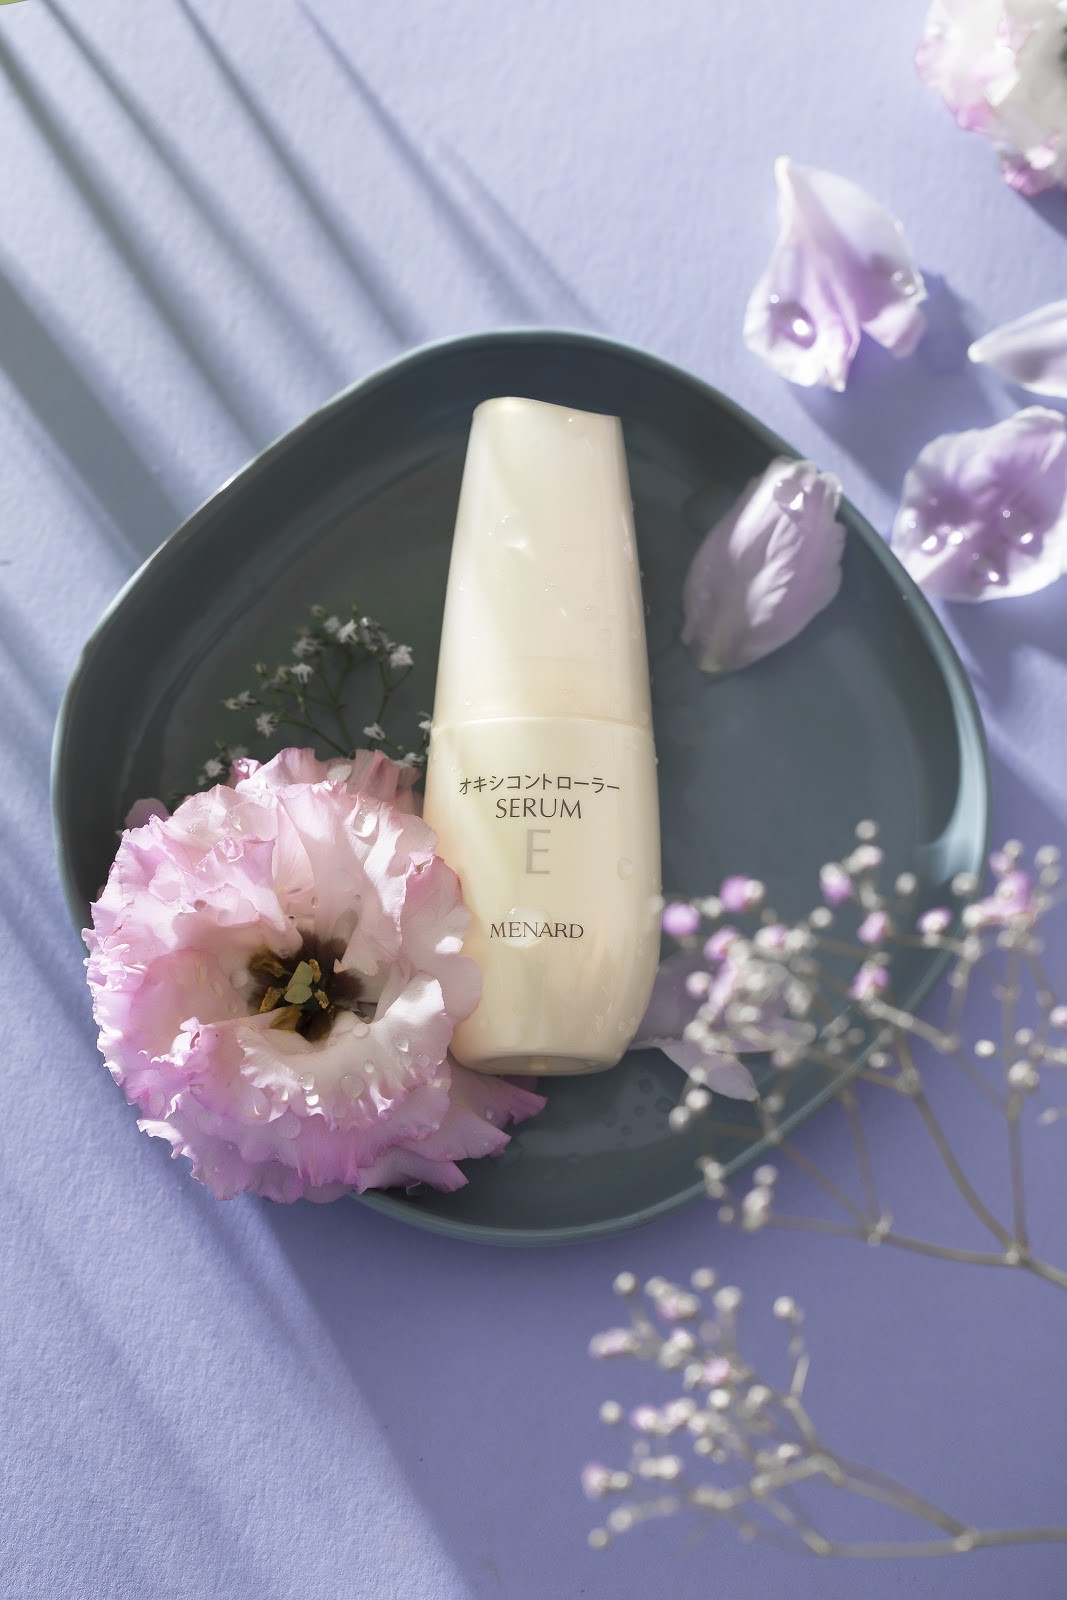 Vẻ đẹp Ikebana – nâng niu đóa hoa nhan sắc - Ảnh 3.